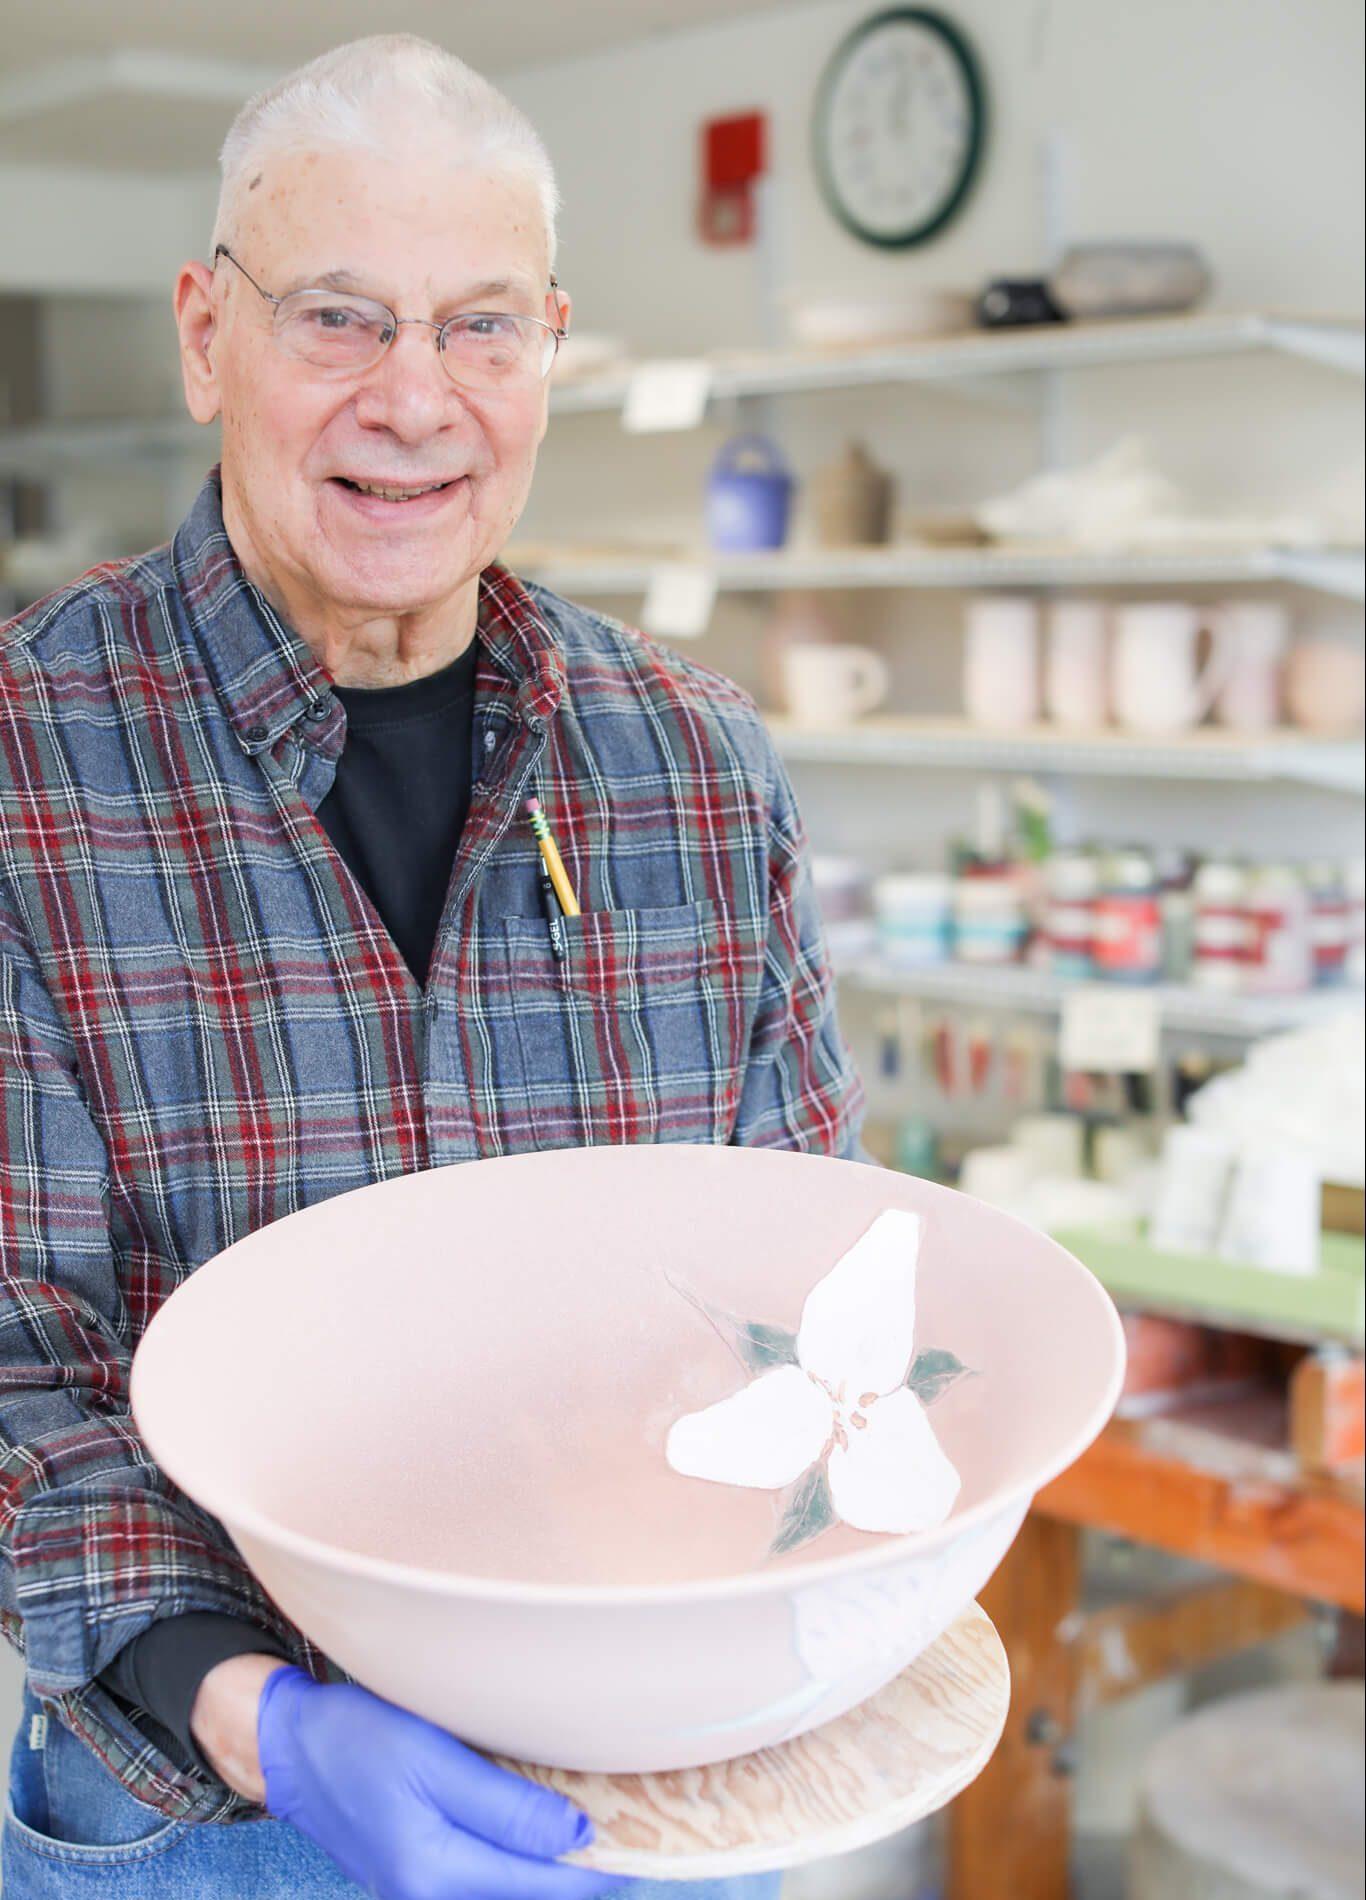 Ted Carvalho With Ceramic Bowl